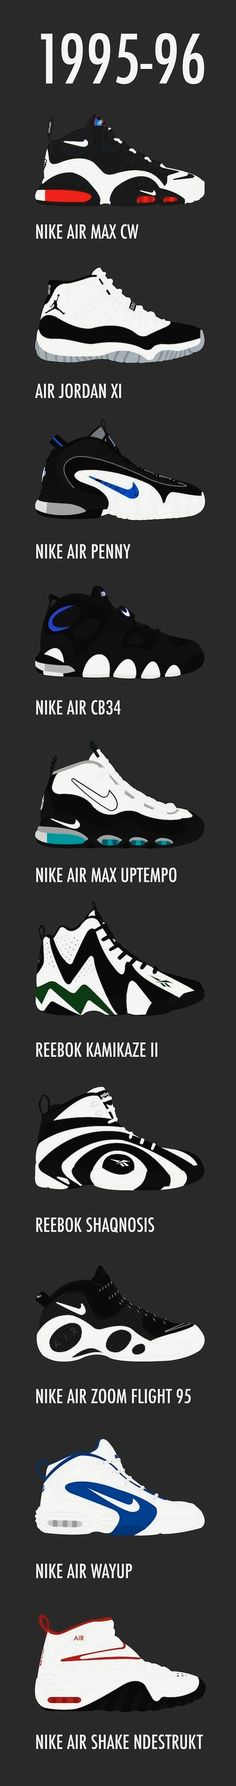 premium selection fc5f8 234b6 90s shoes were the best! Nike Basketball ShoesHypebeastSneaker ArtSneaker  GamesSneaker BootsJordans ...